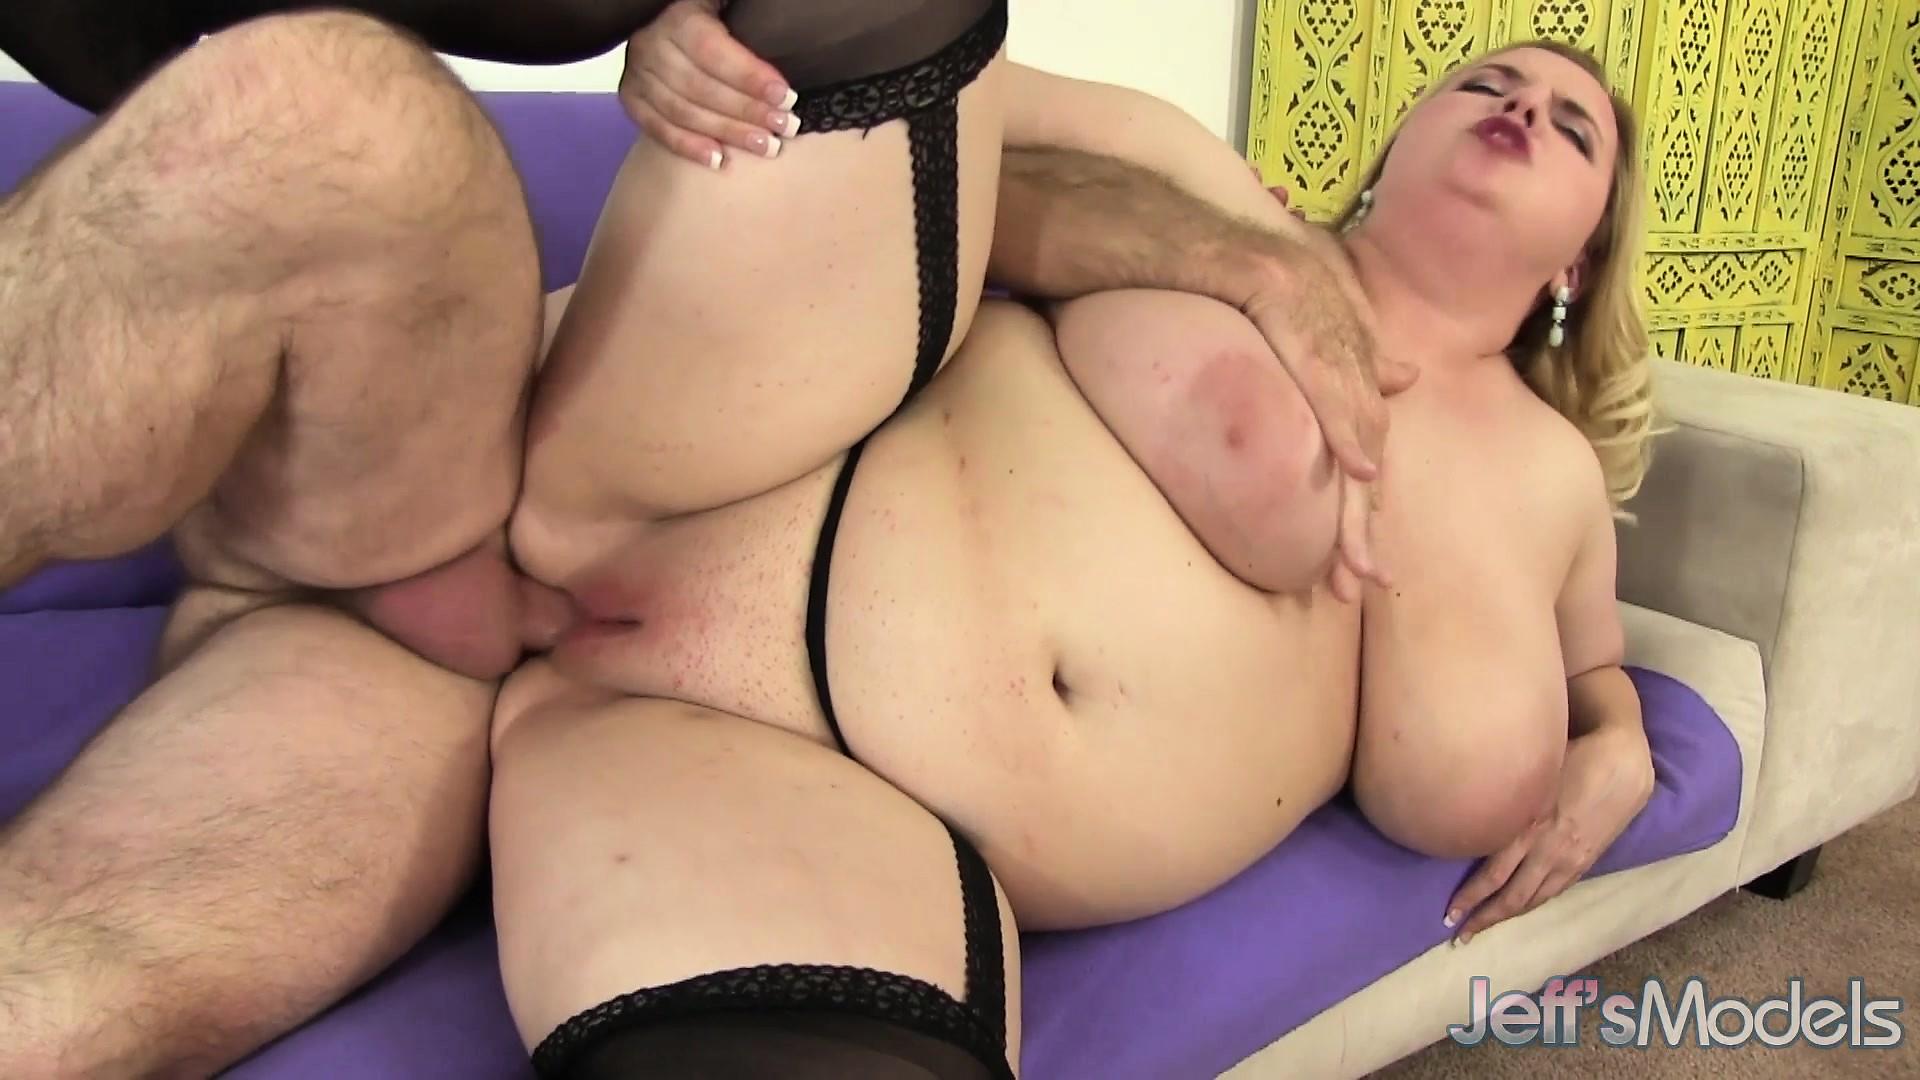 hd порно толстушки великобритания видео